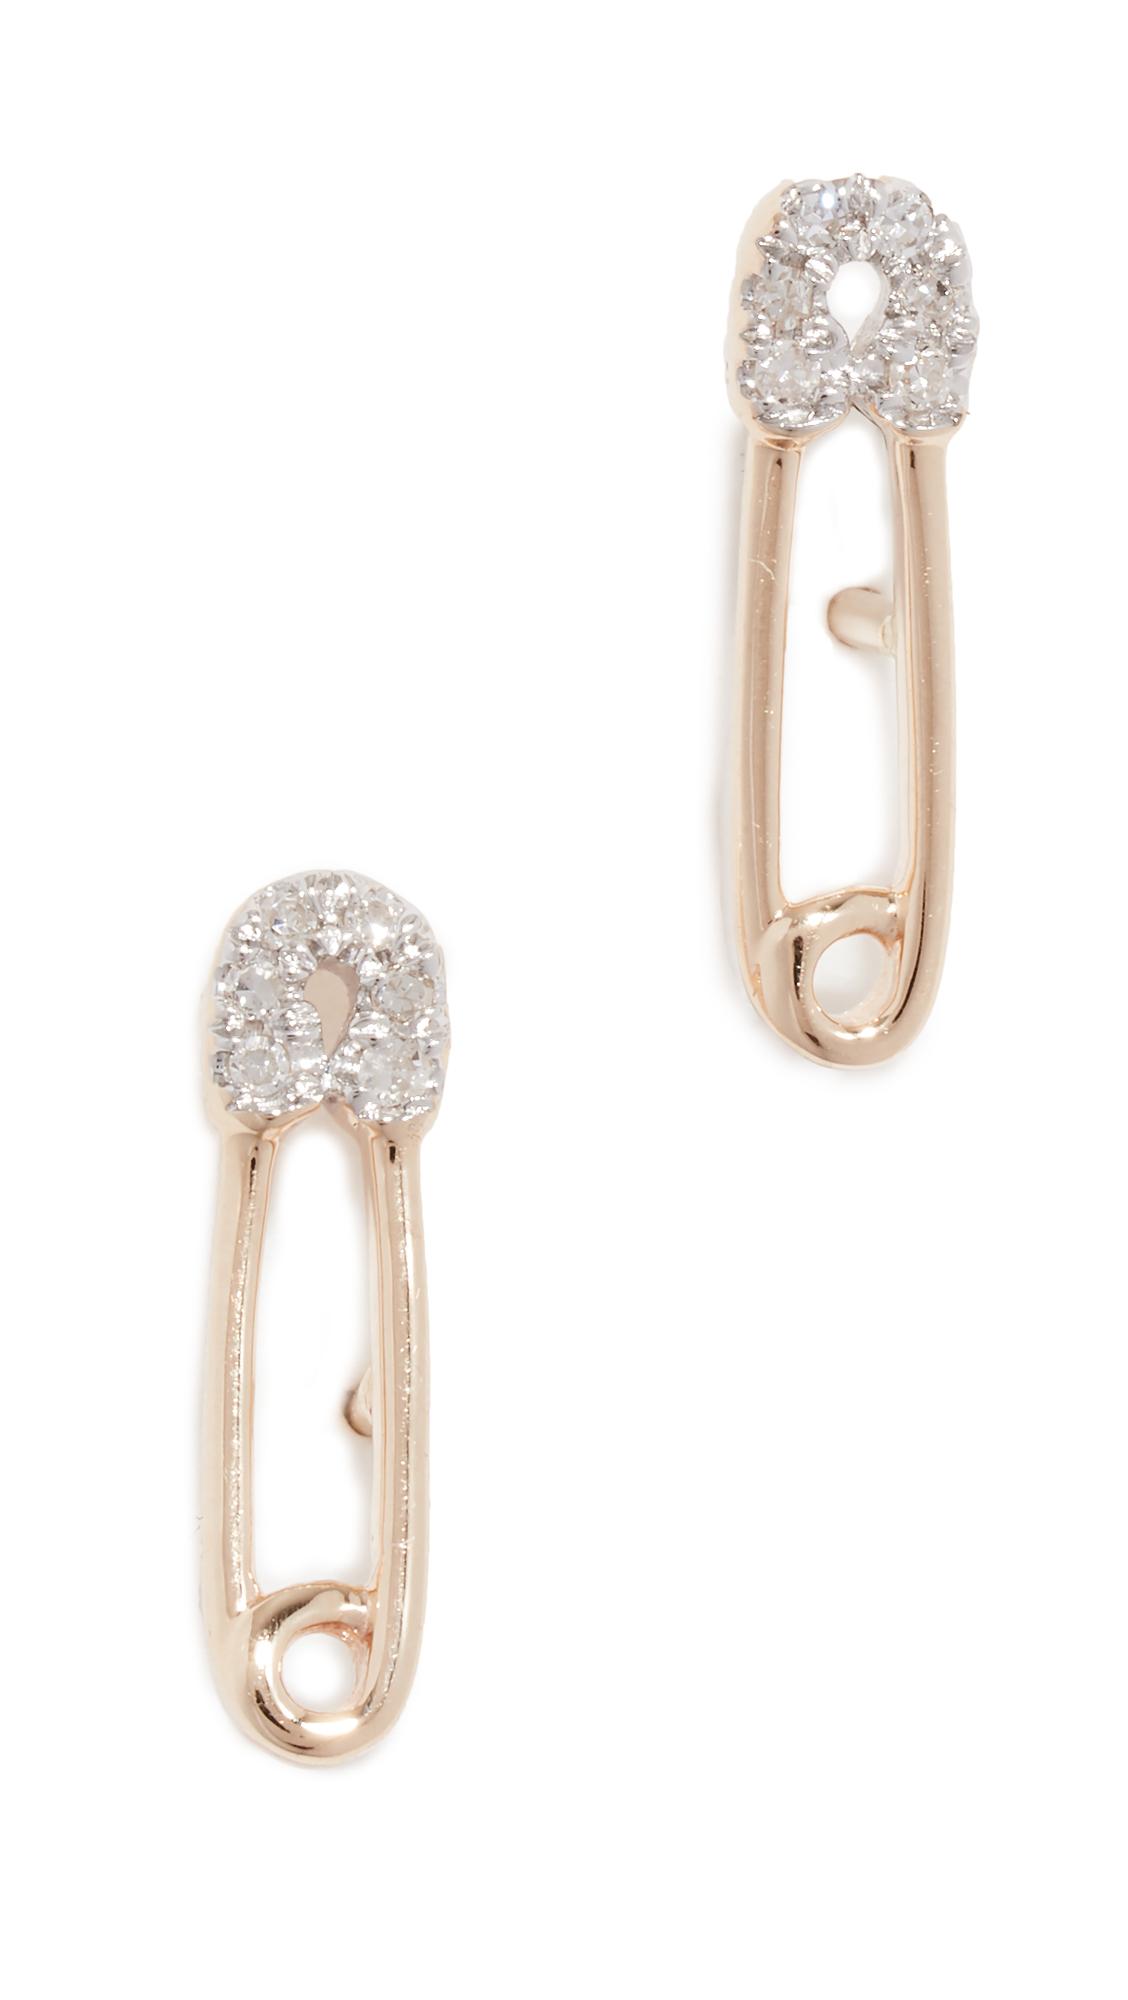 ADINA REYTER 14K Diamond Safety Pin Post Earrings in Yellow Gold